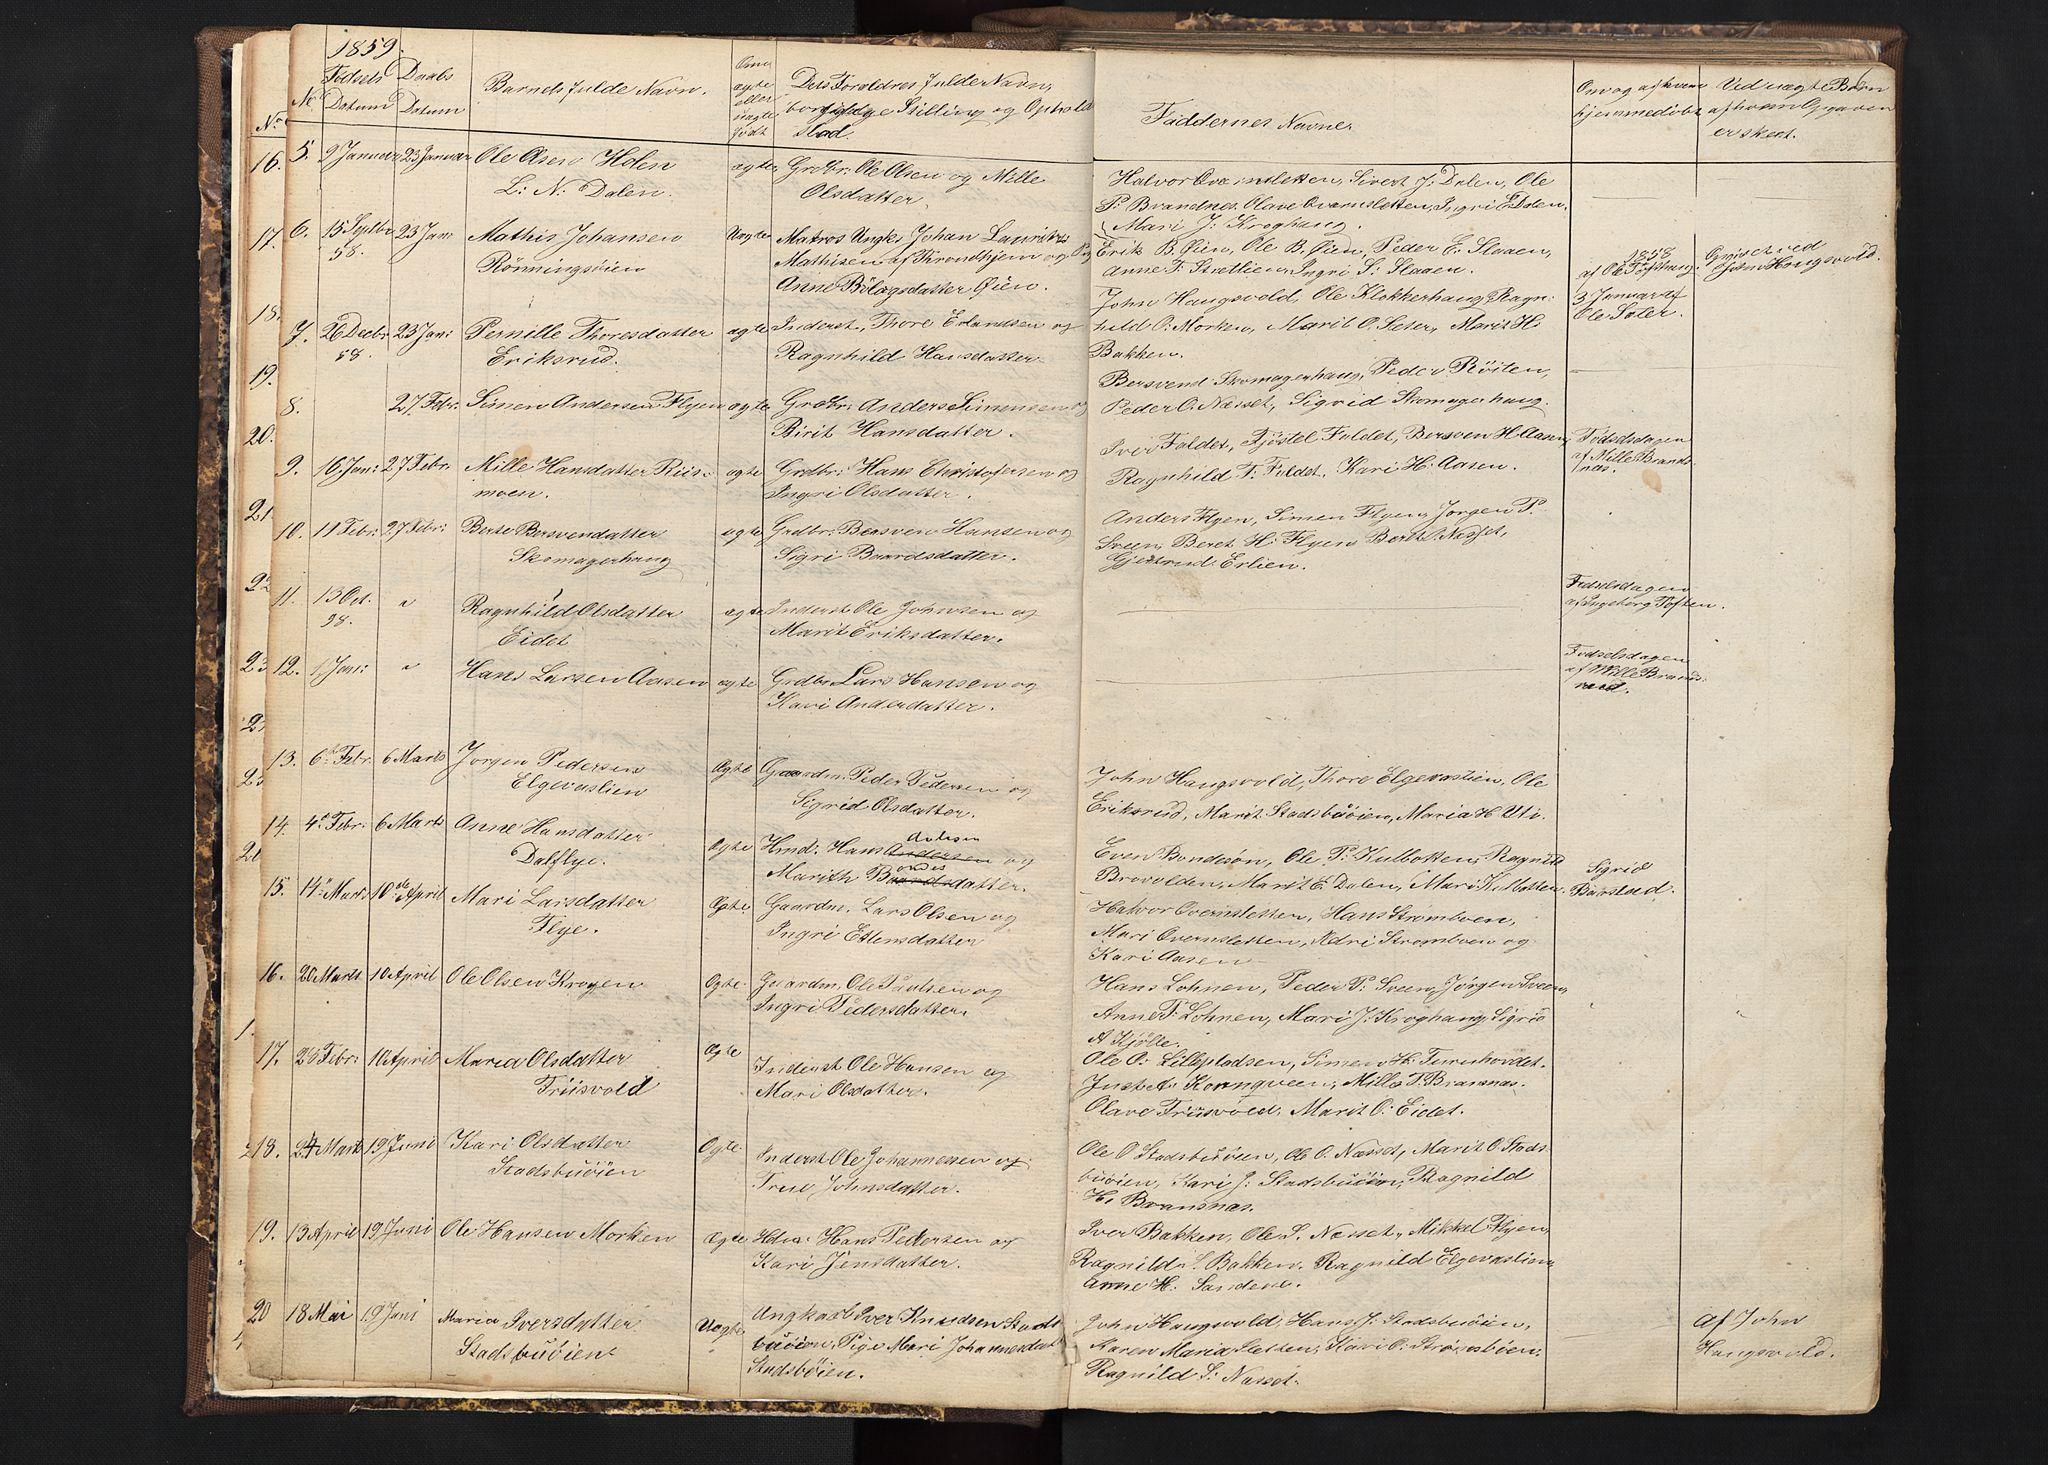 SAH, Alvdal prestekontor, Klokkerbok nr. 1, 1857-1893, s. 6